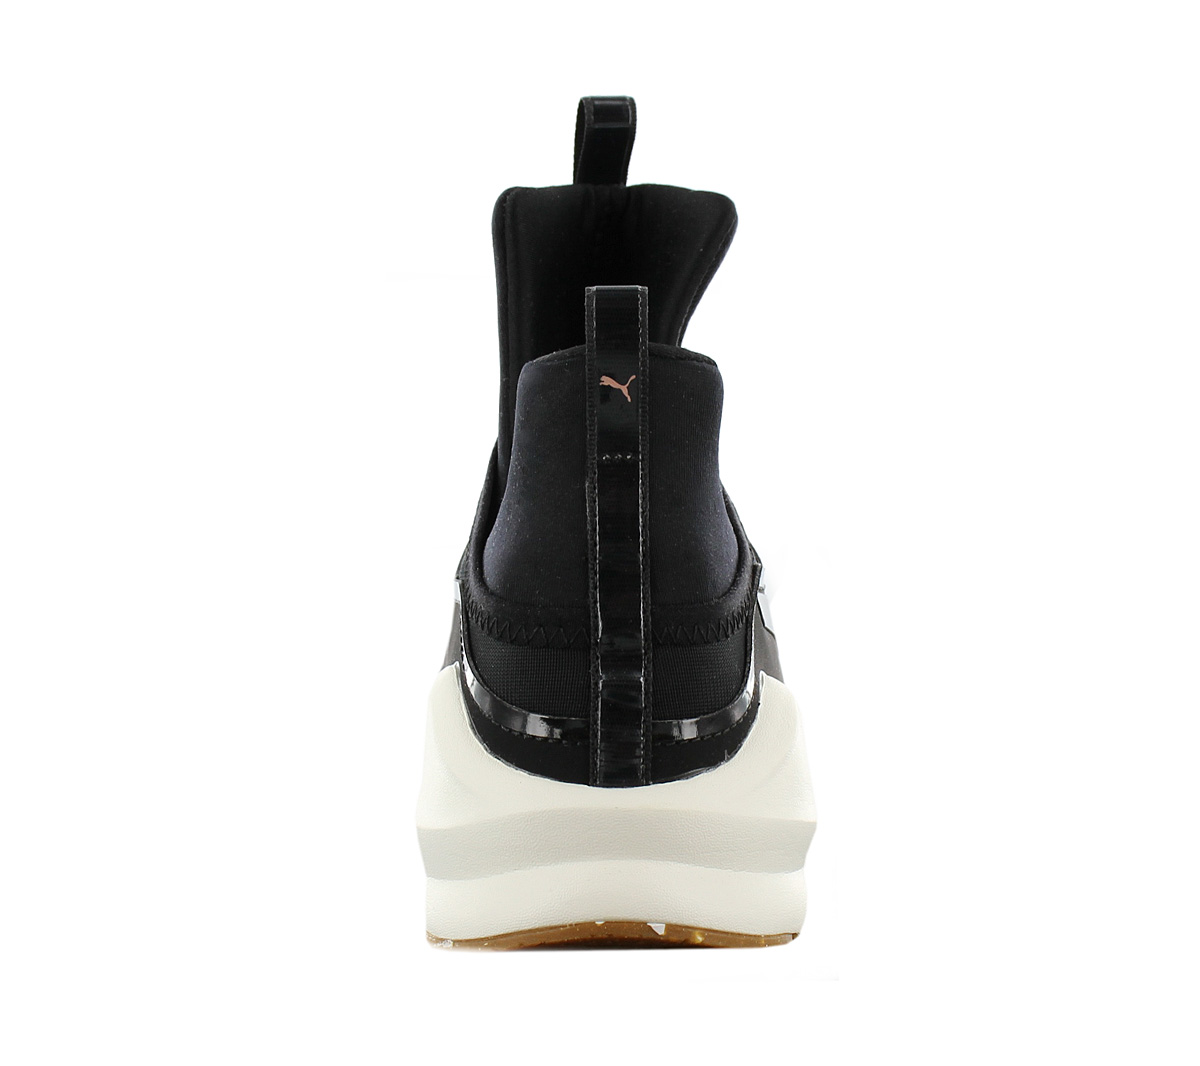 f925bc6d0a4 NEW Puma Fierce VR Velvet Rope 190347-01 Women`s Shoes Trainers ...